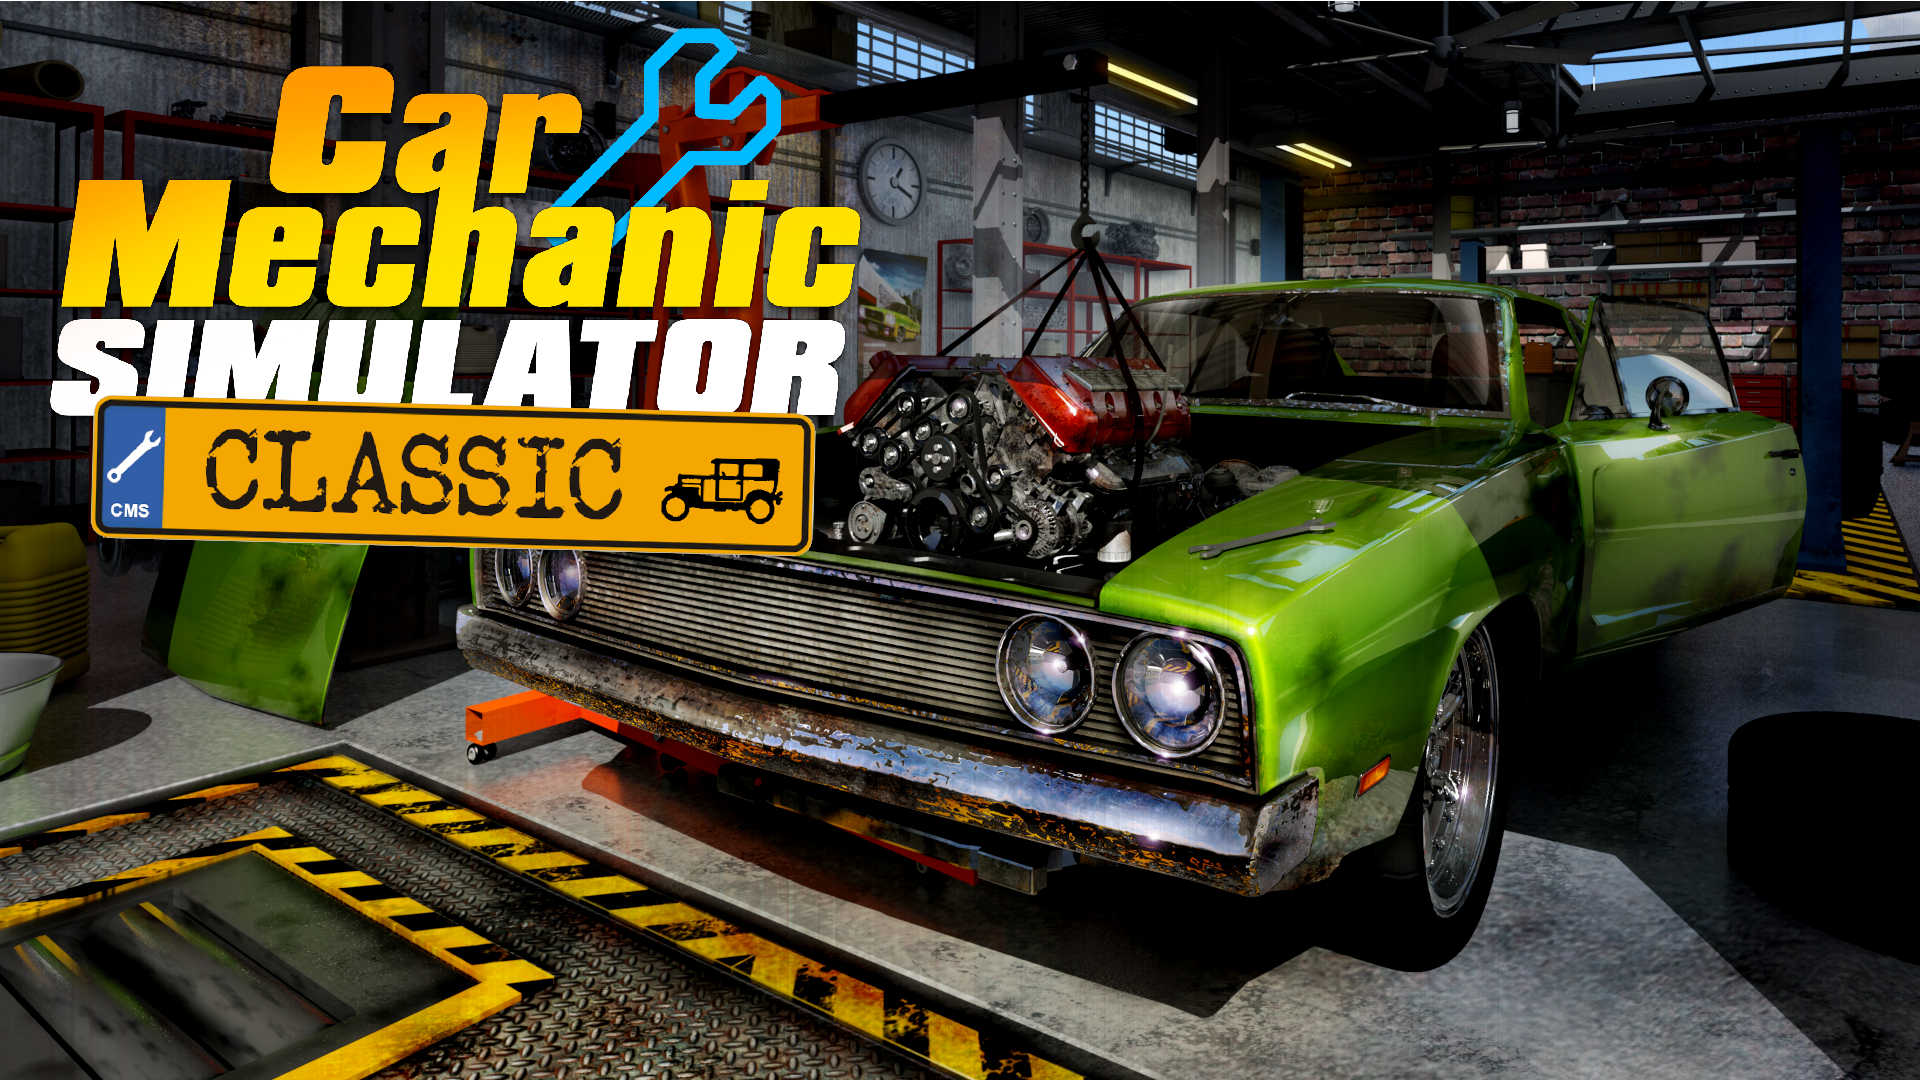 Car Mechanic Simulator Classic logo and artwork